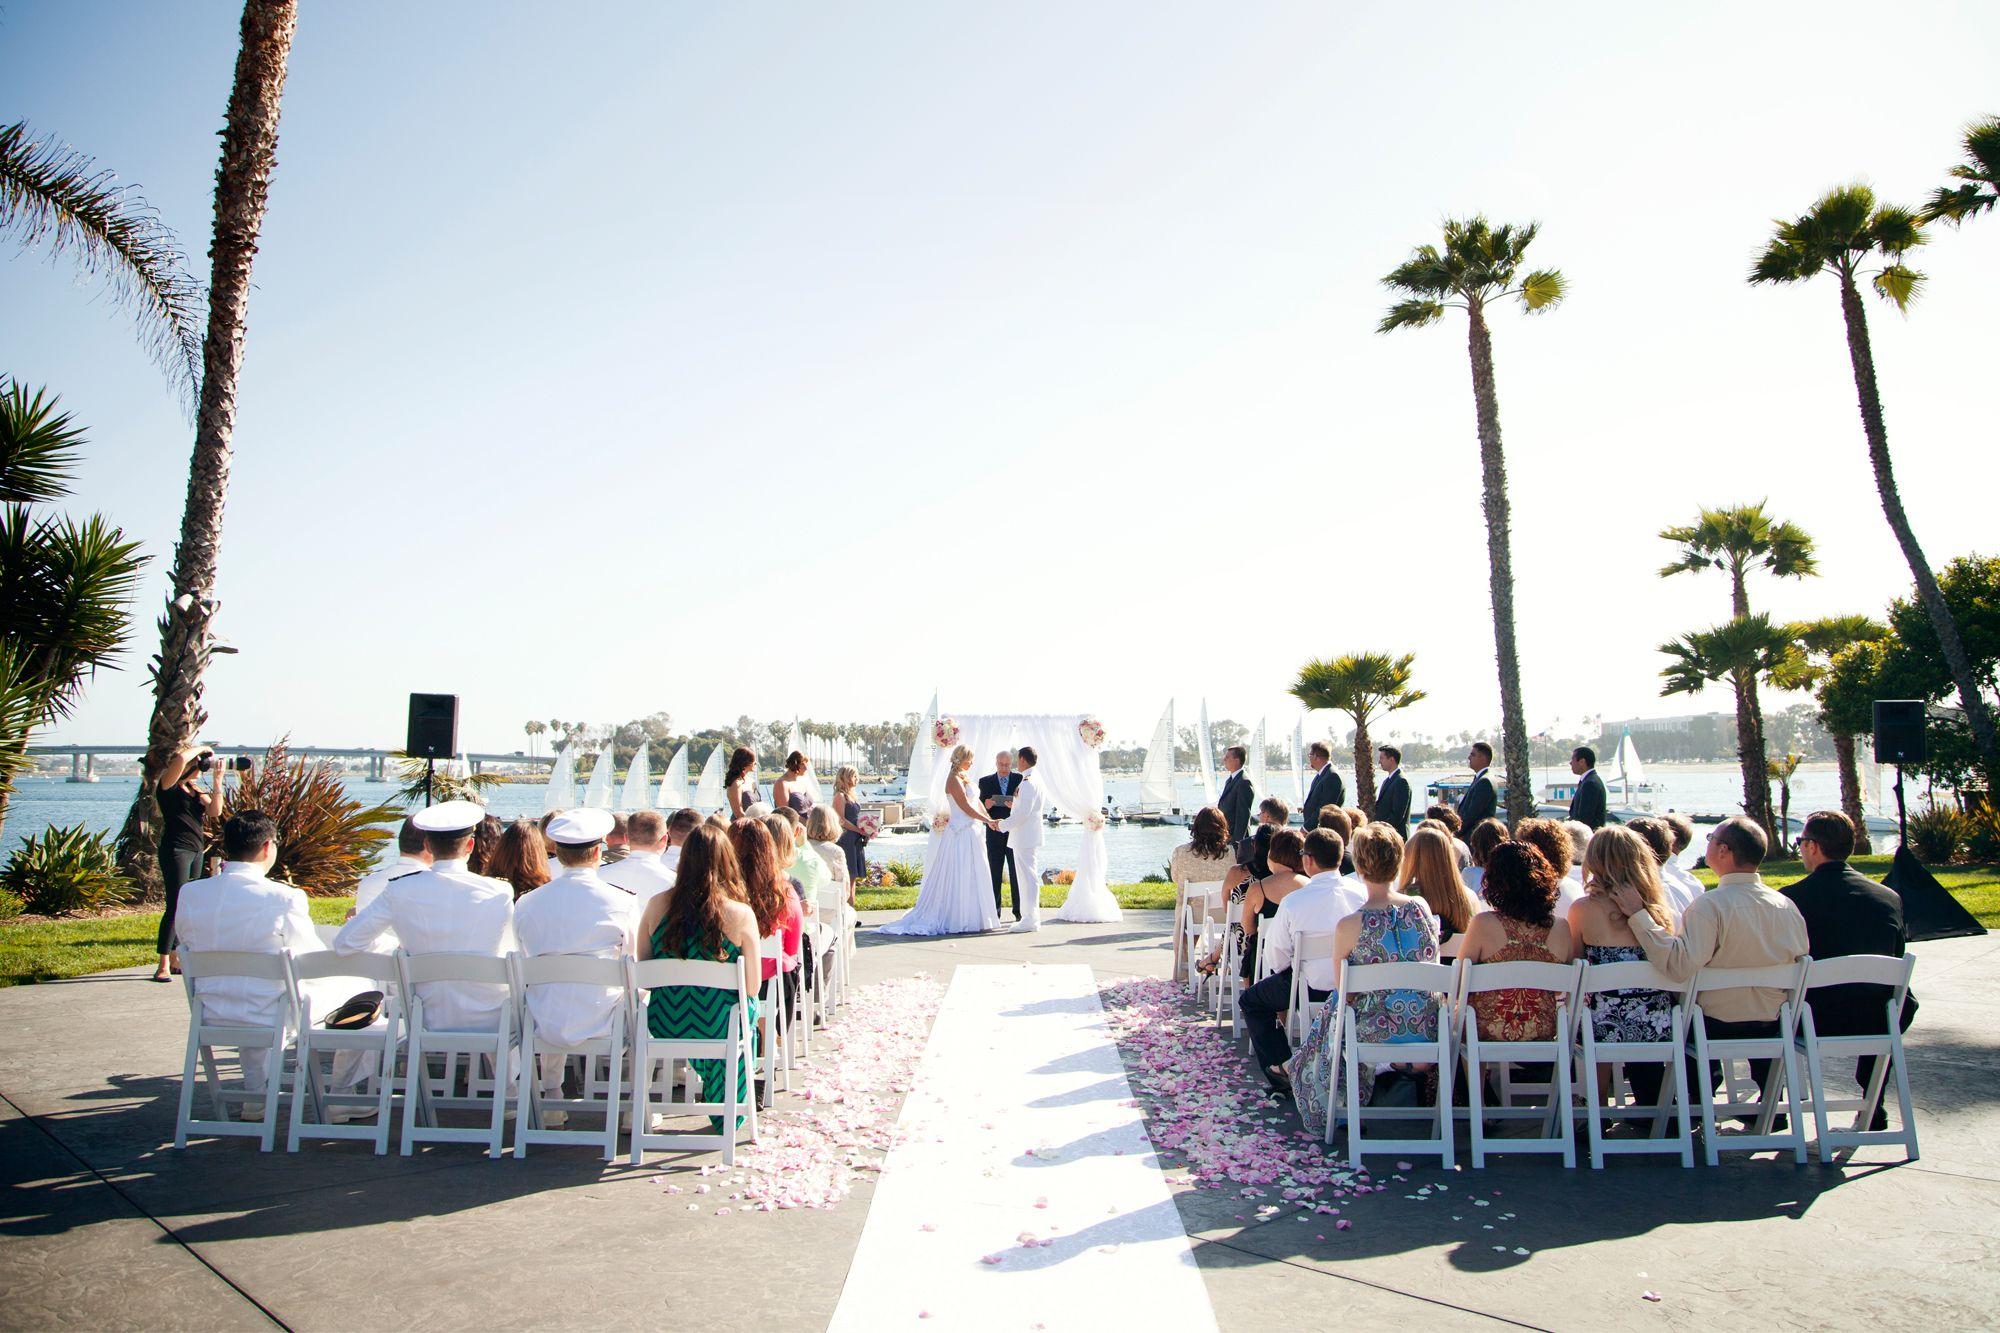 Paradise Terrace wedding venue in San Diego at Paradise